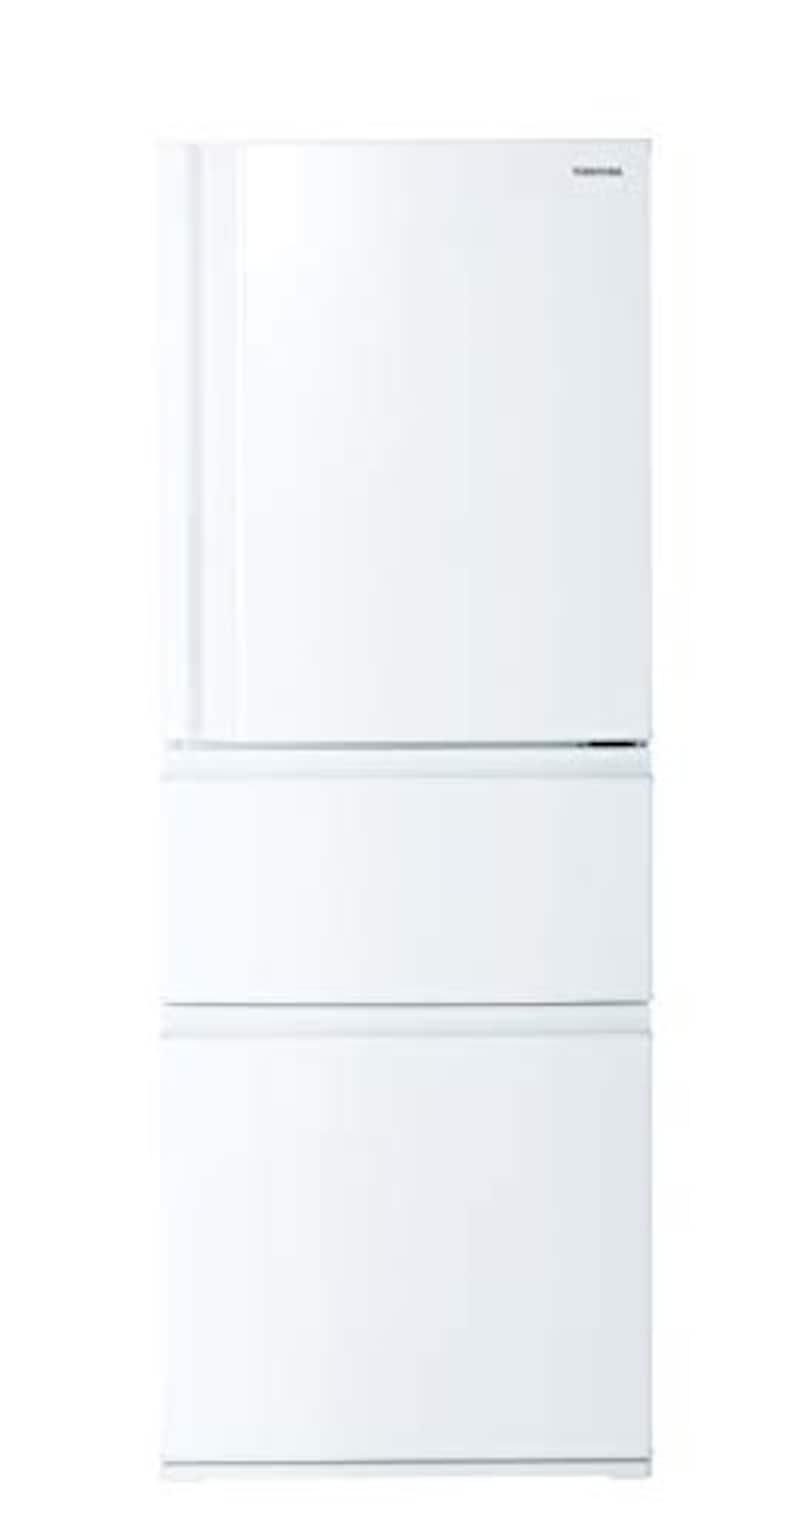 TOSHIBA(東芝),VEGETA(ベジータ)冷蔵庫 SCシリーズ,GR-S33SC-WT